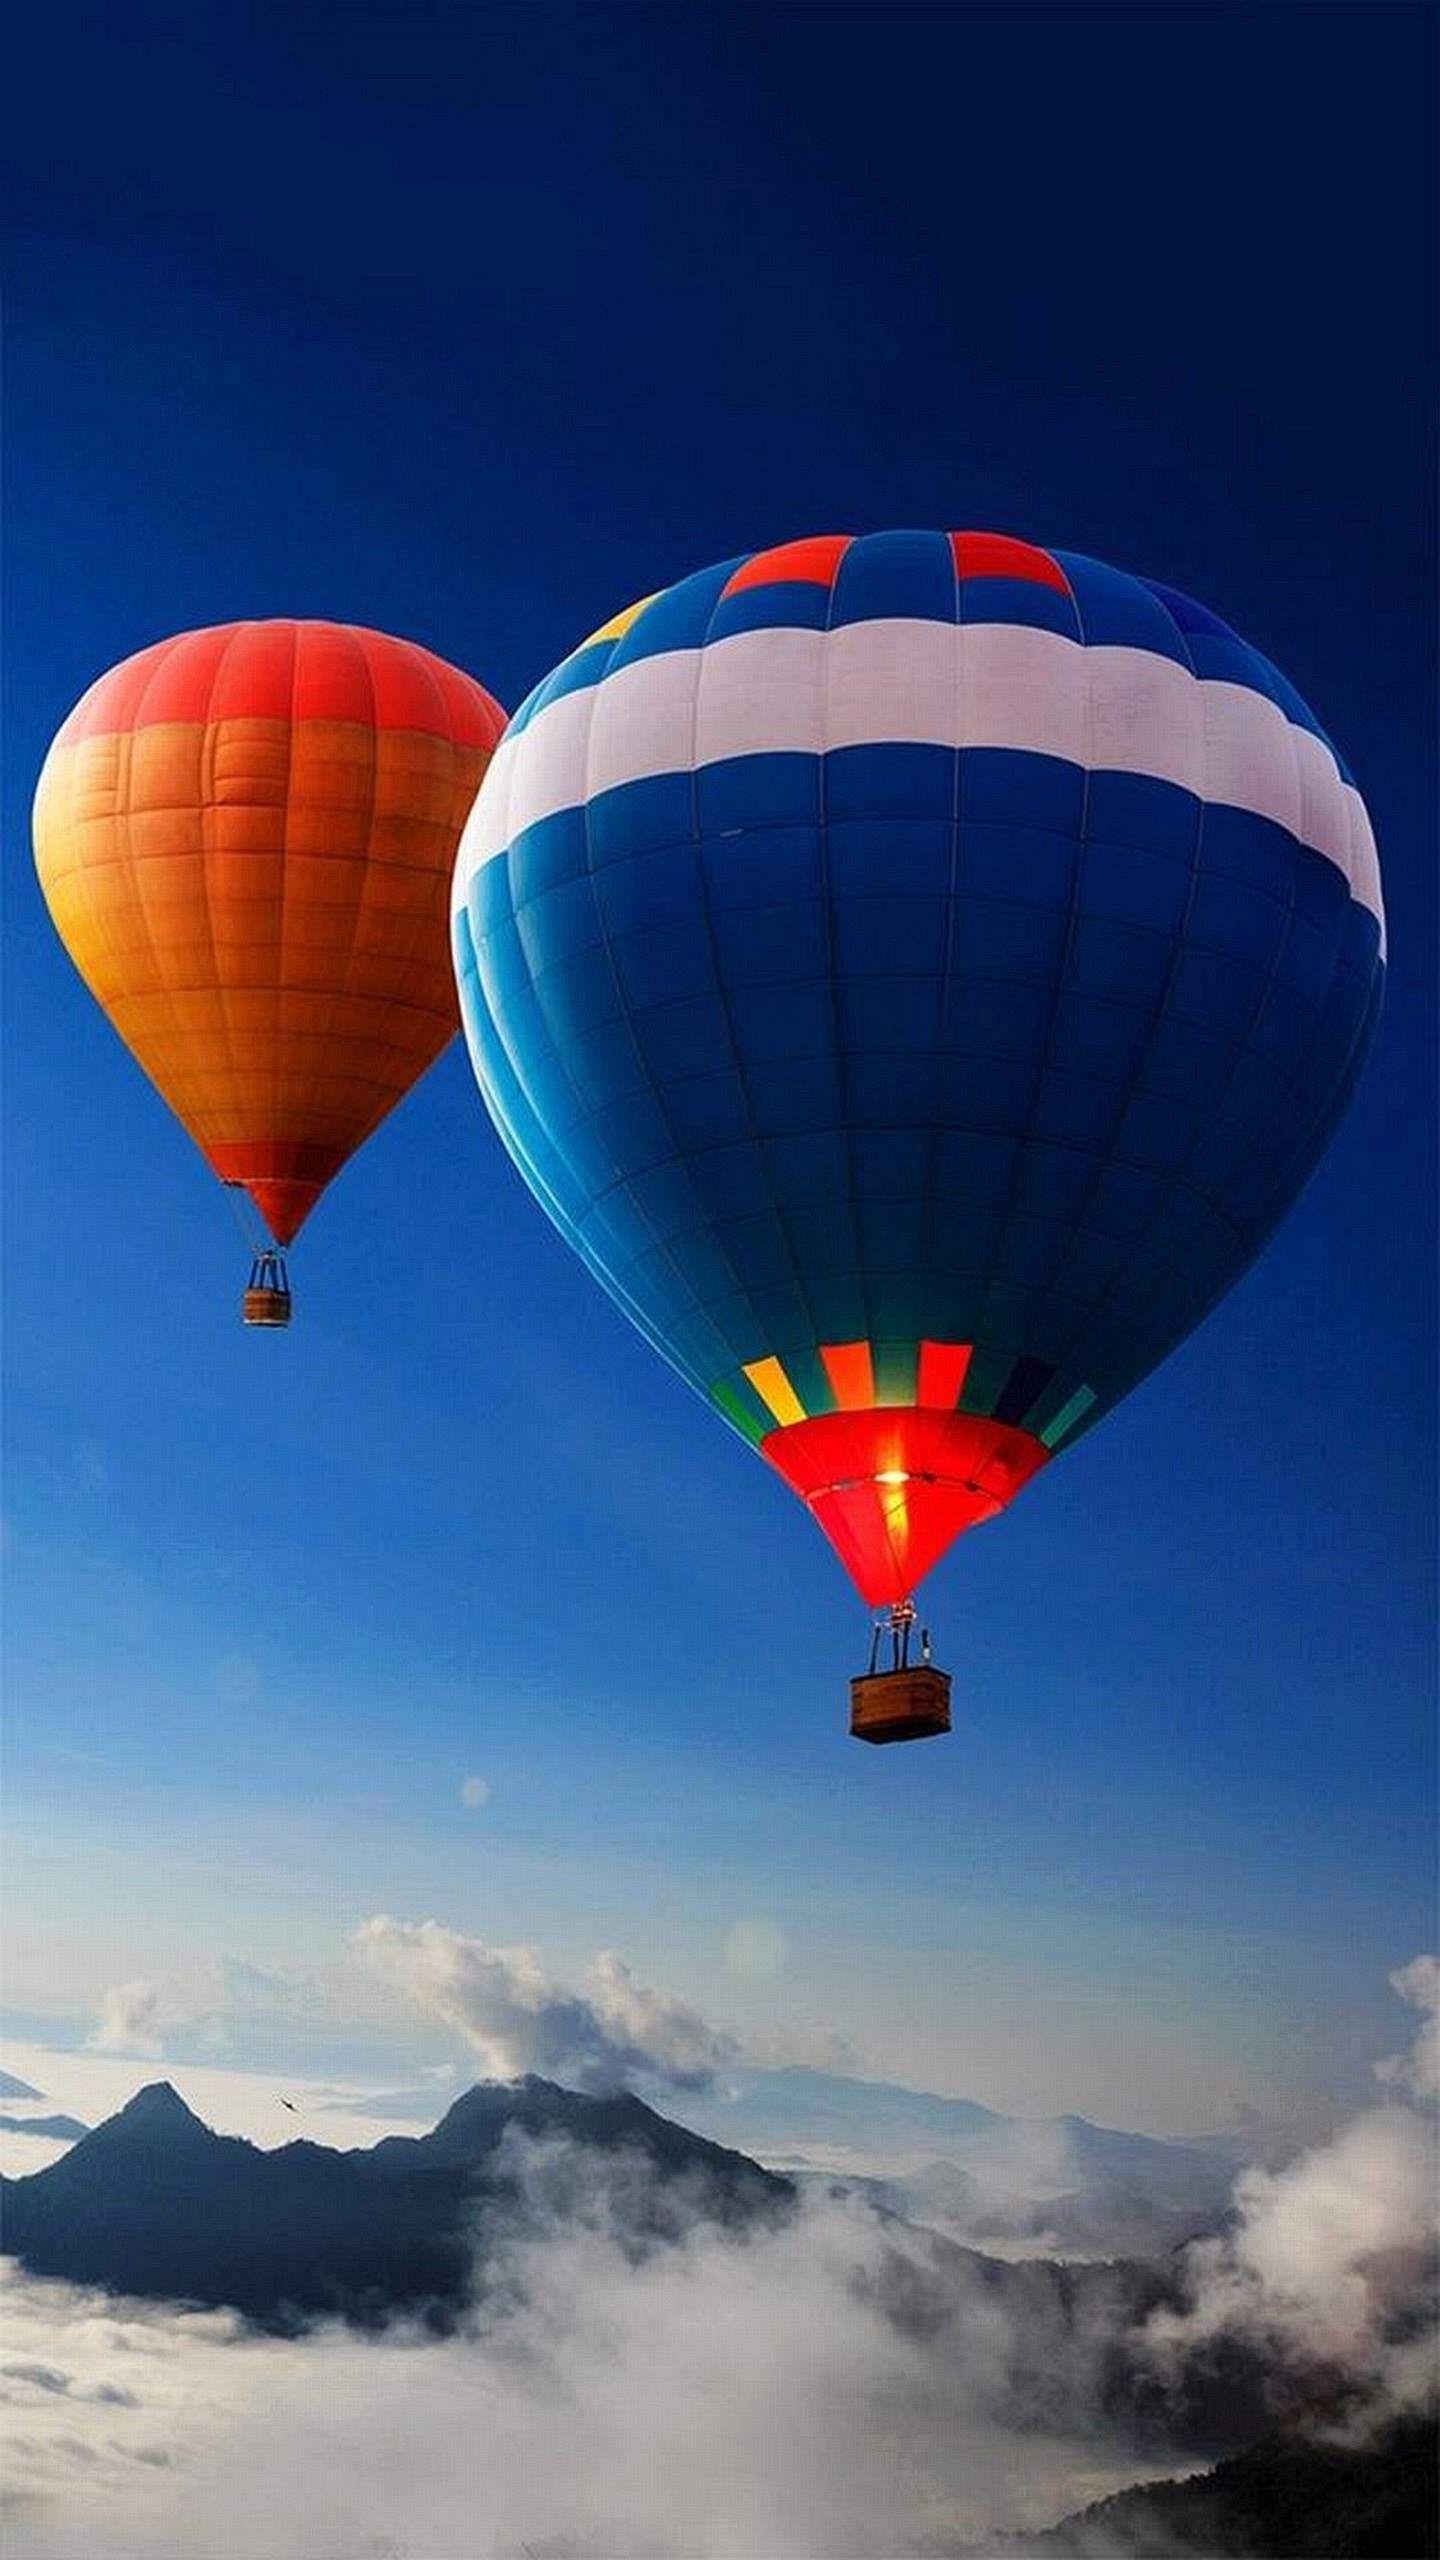 Samsung S6 S6 Plus S6 Edge Note 4 Note 5 And Note Edge Wallpapers Hot Air Balloon Rides Hot Air Balloon Hot Air Ballon